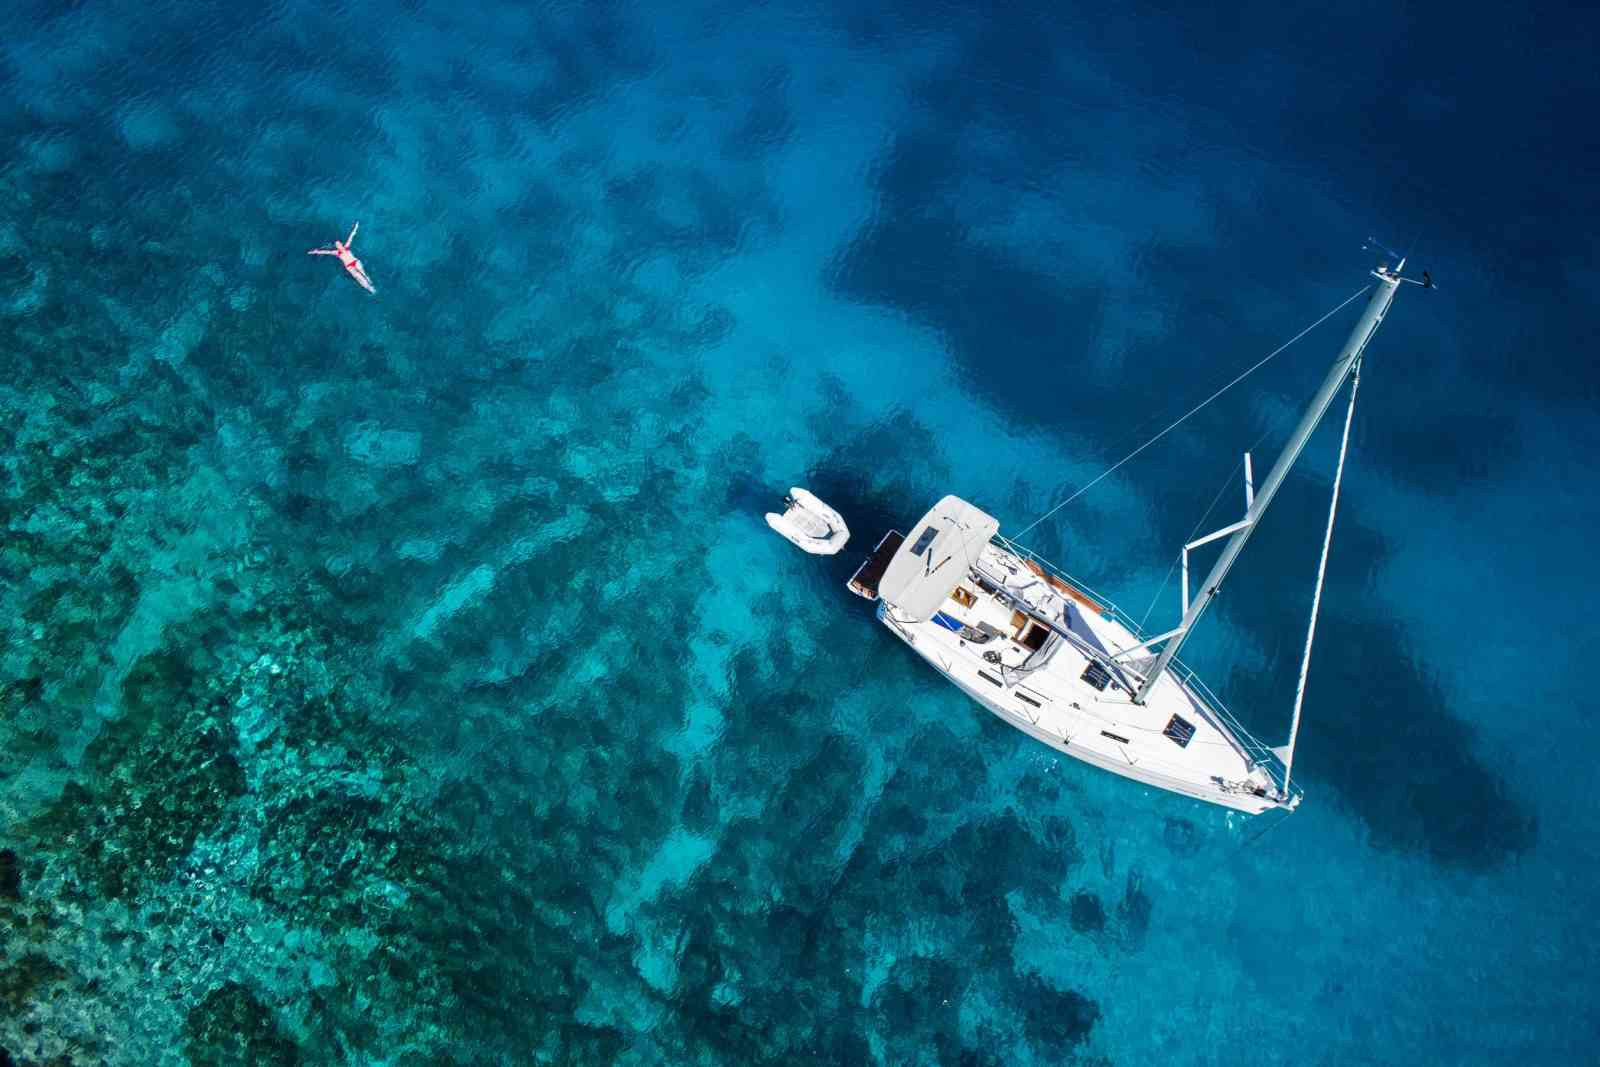 sailing to byzantium critical essays